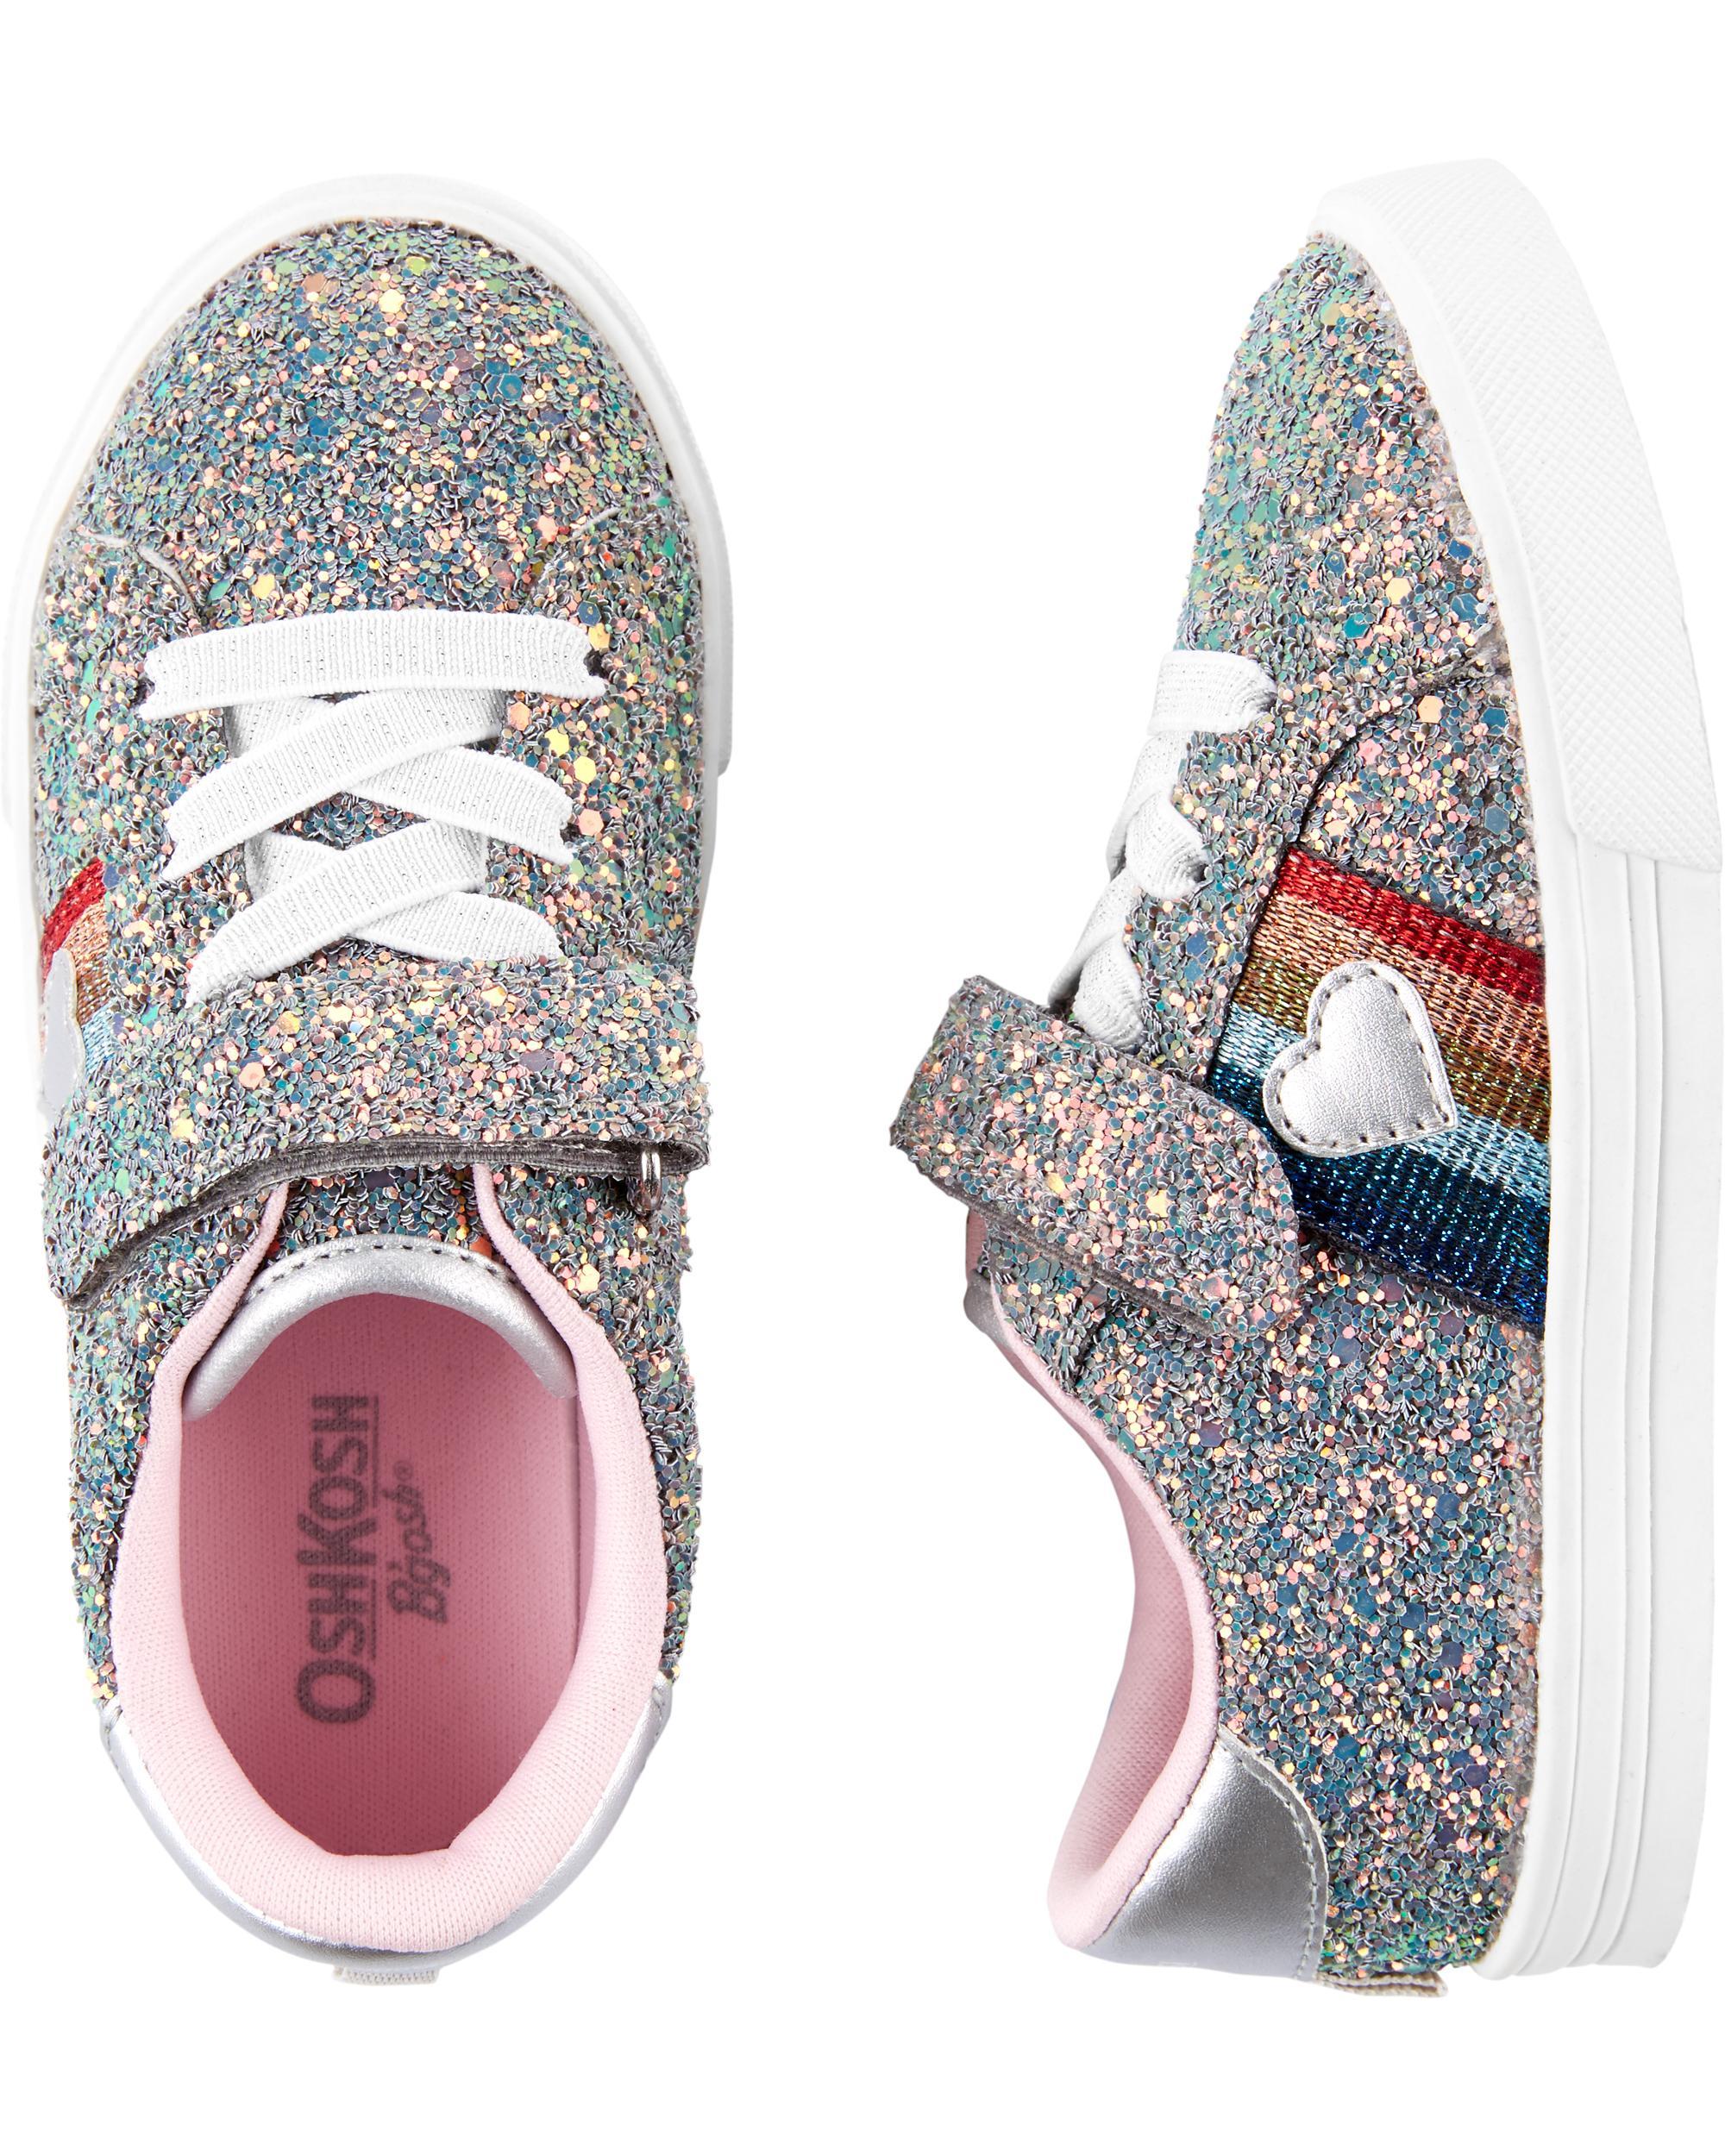 a095726641 OshKosh Glitter Rainbow Sneakers | carters.com